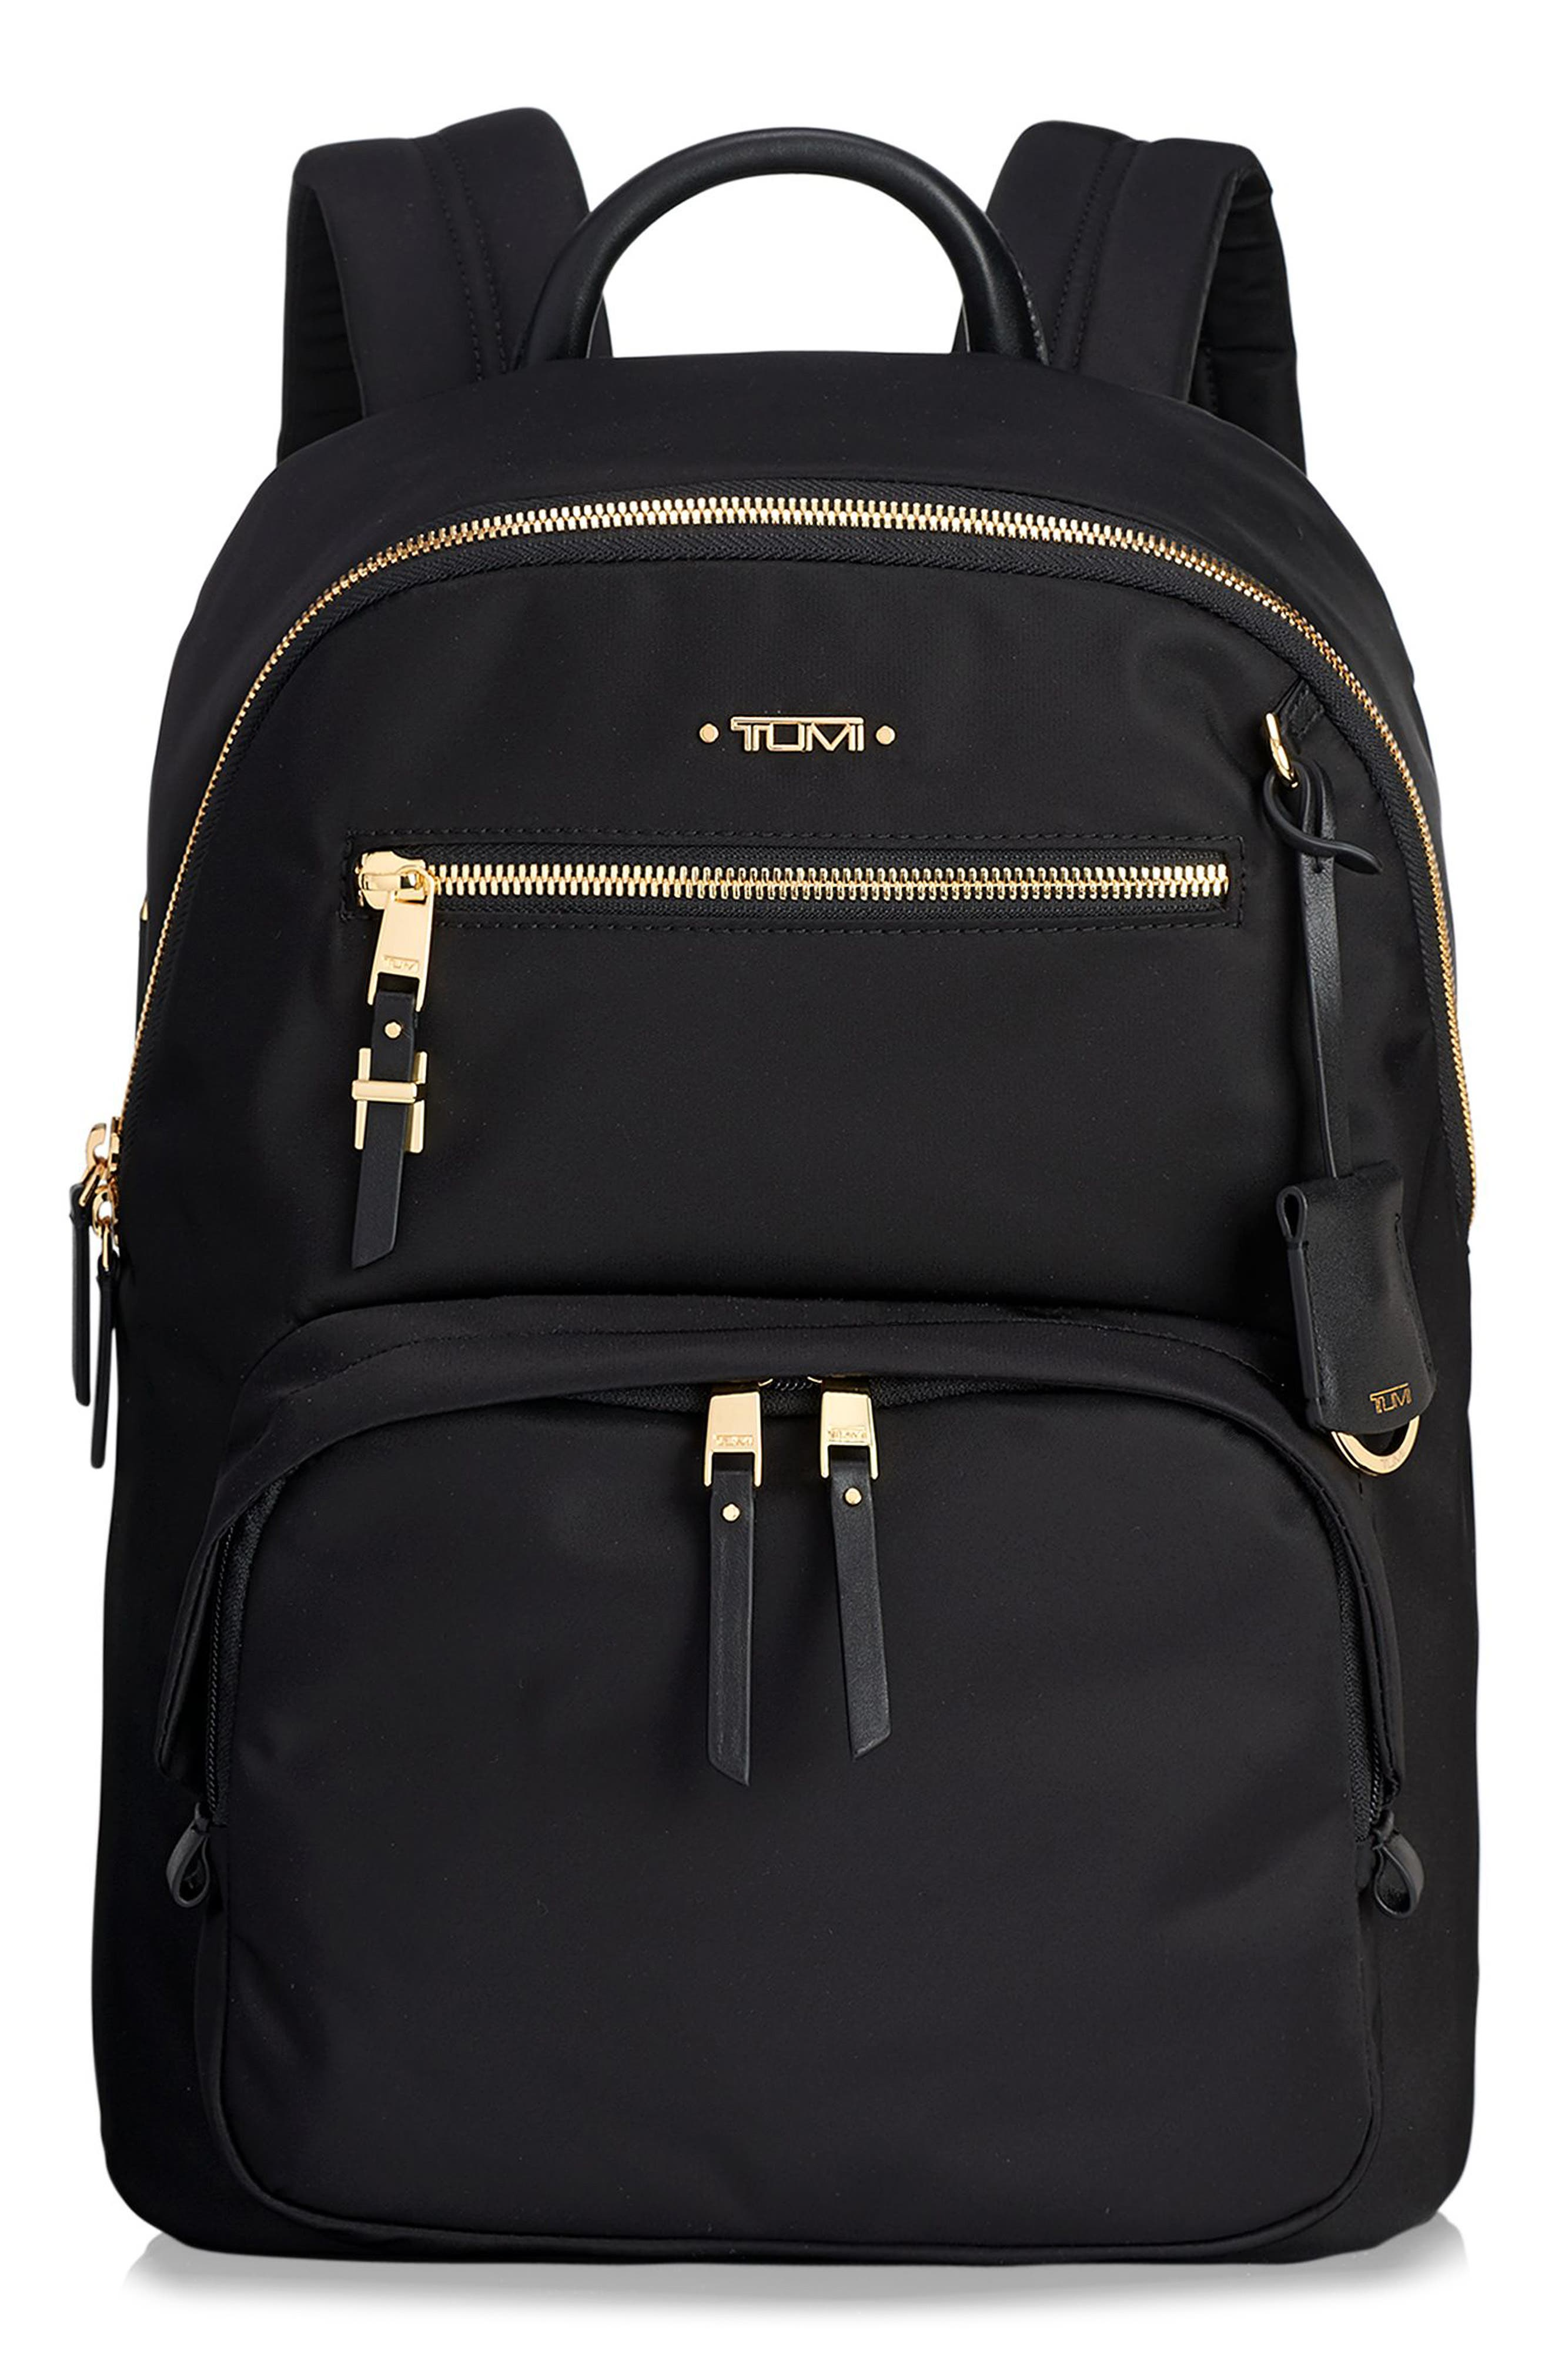 TUMI Voyageur Hagen Nylon Backpack, Main, color, BLACK